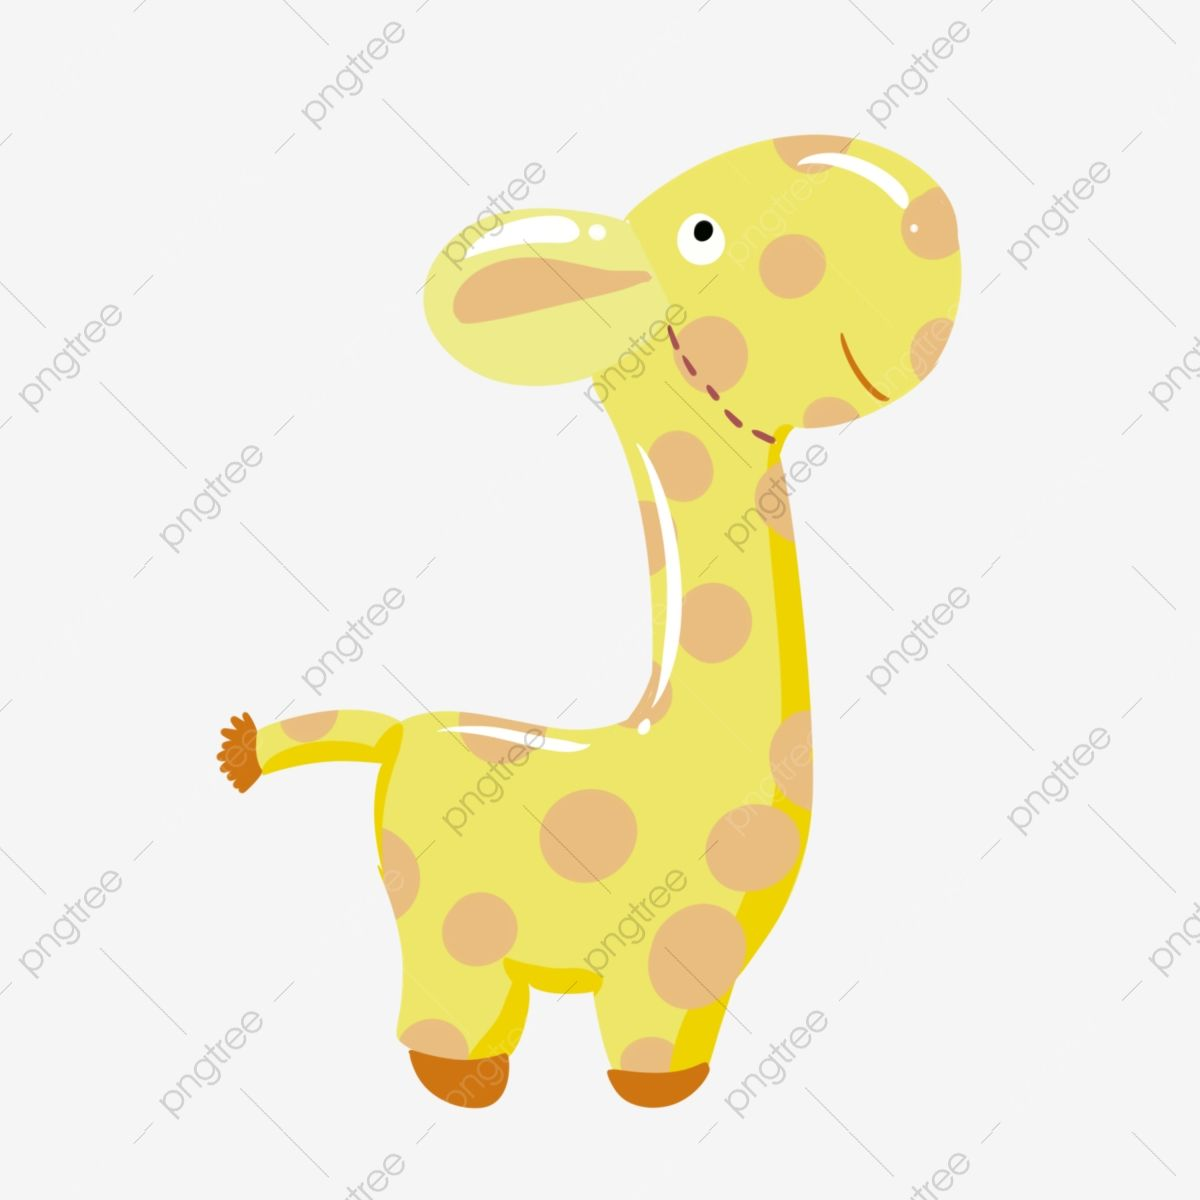 Animal Giraffe Animal Clipart Giraffe Clipart Giraffe Png Transparent Clipart Image And Psd File For Free Downloa Giraffe Clipart Animal Clipart Giraffe Png